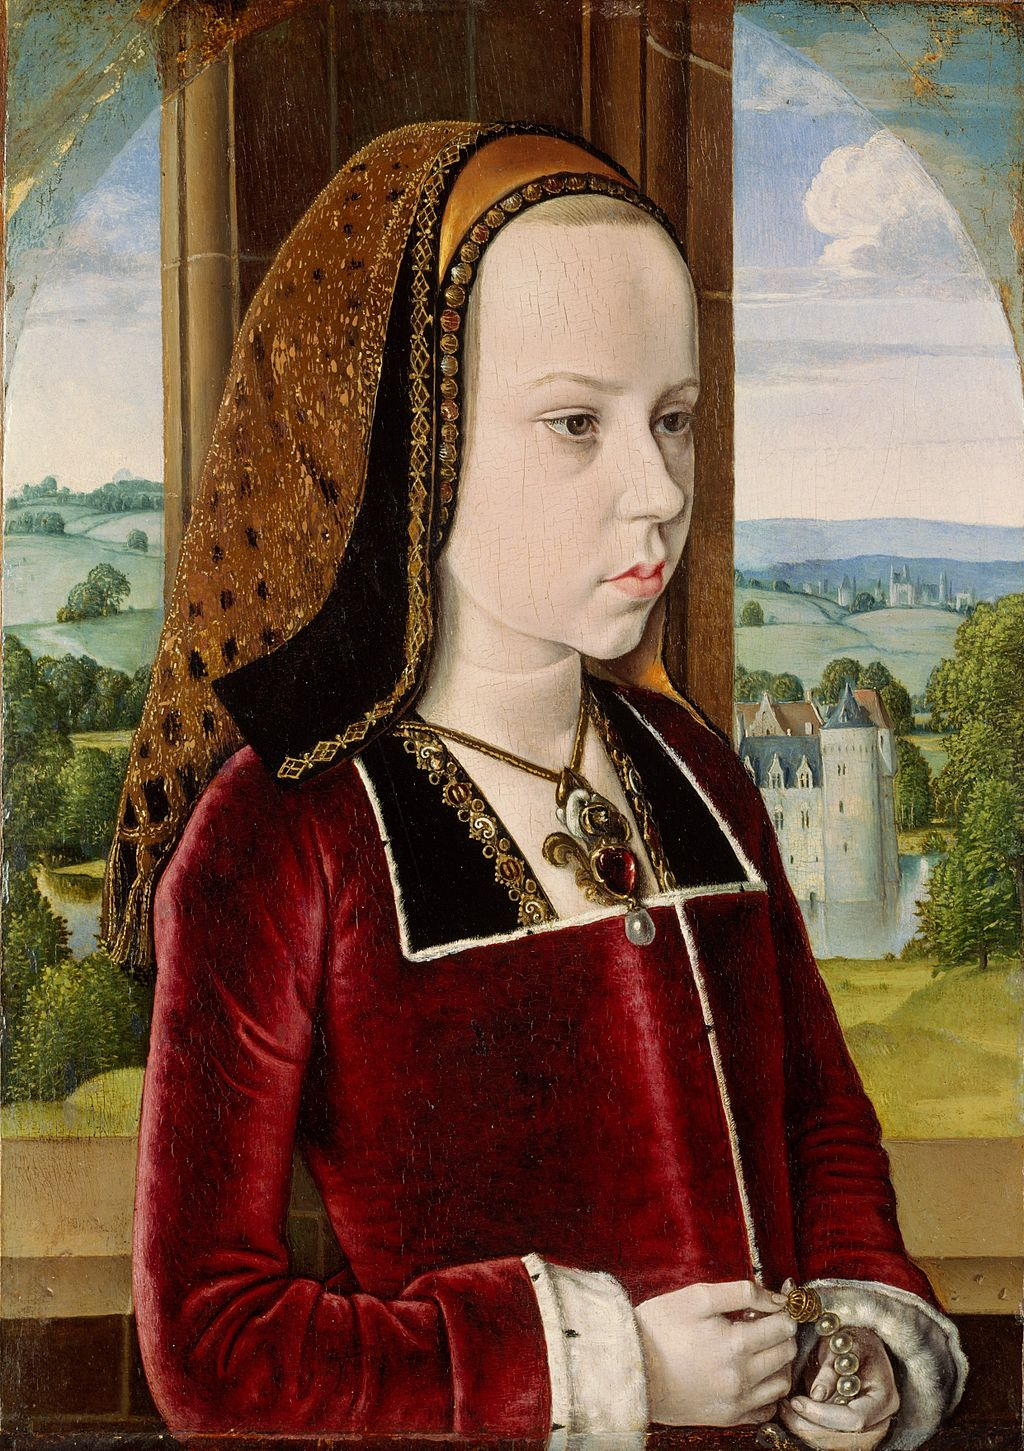 Master of Moulins (fl. circa 1480-1500)